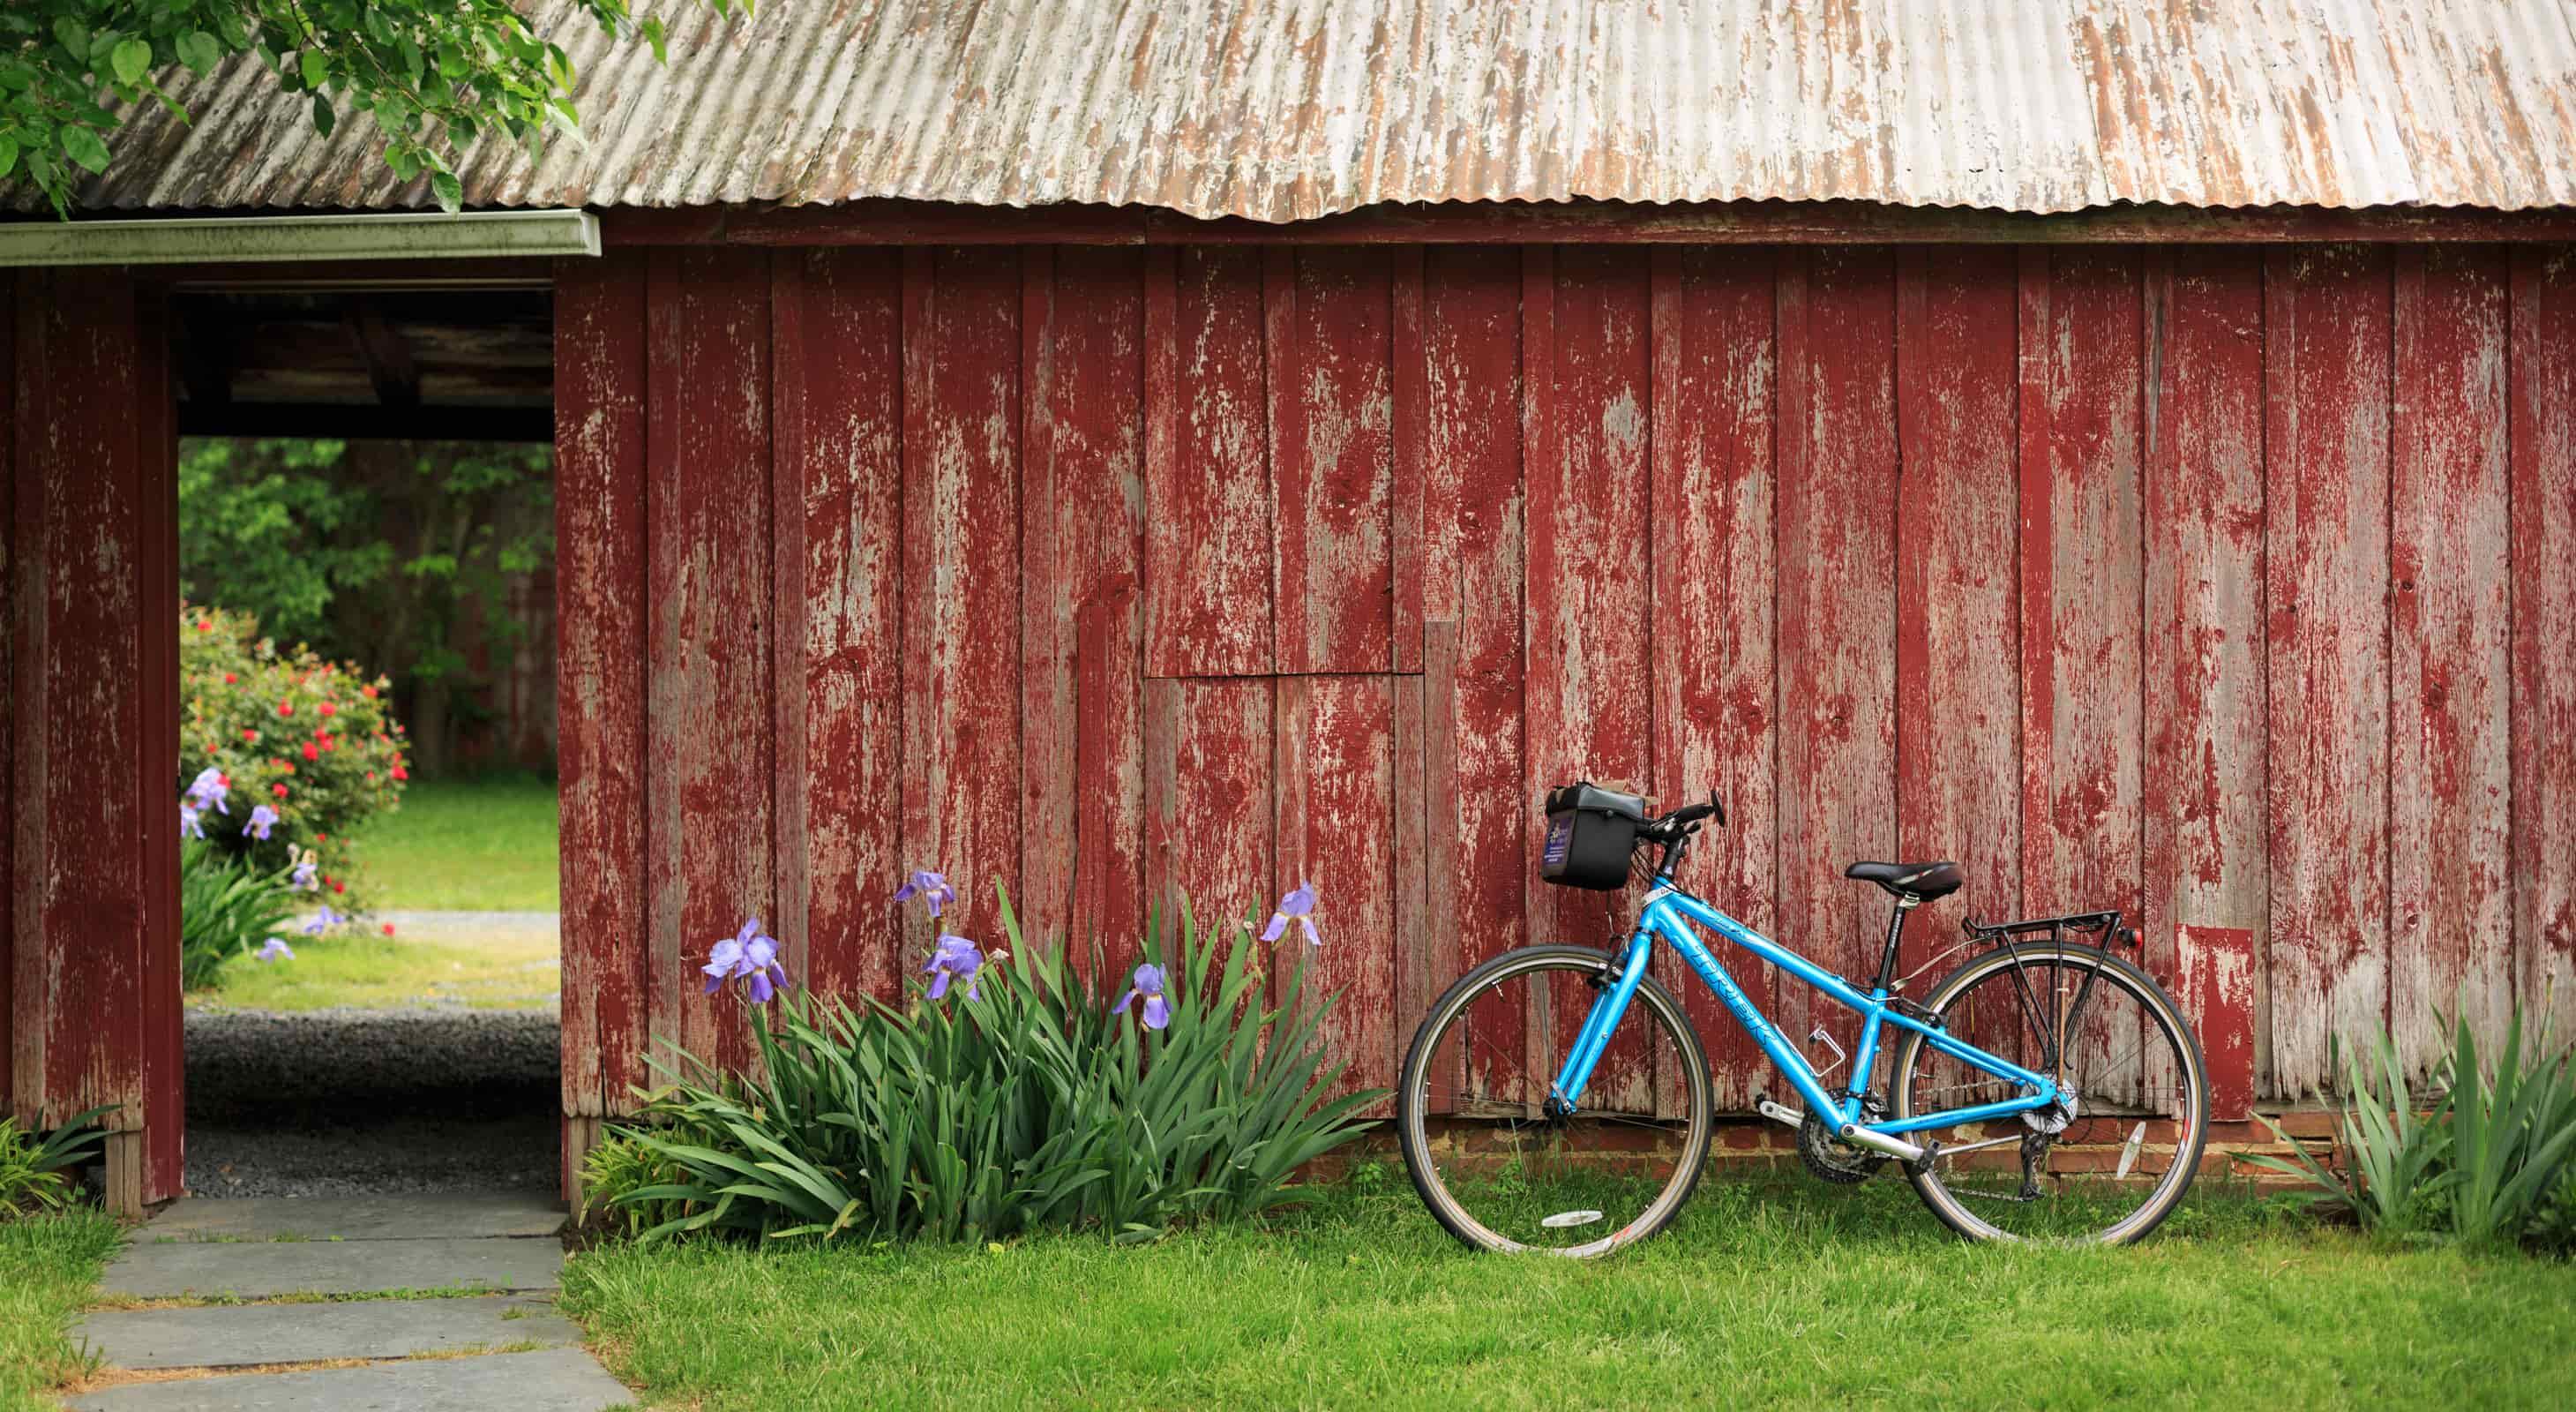 Bike Rental at our Maryland B&B